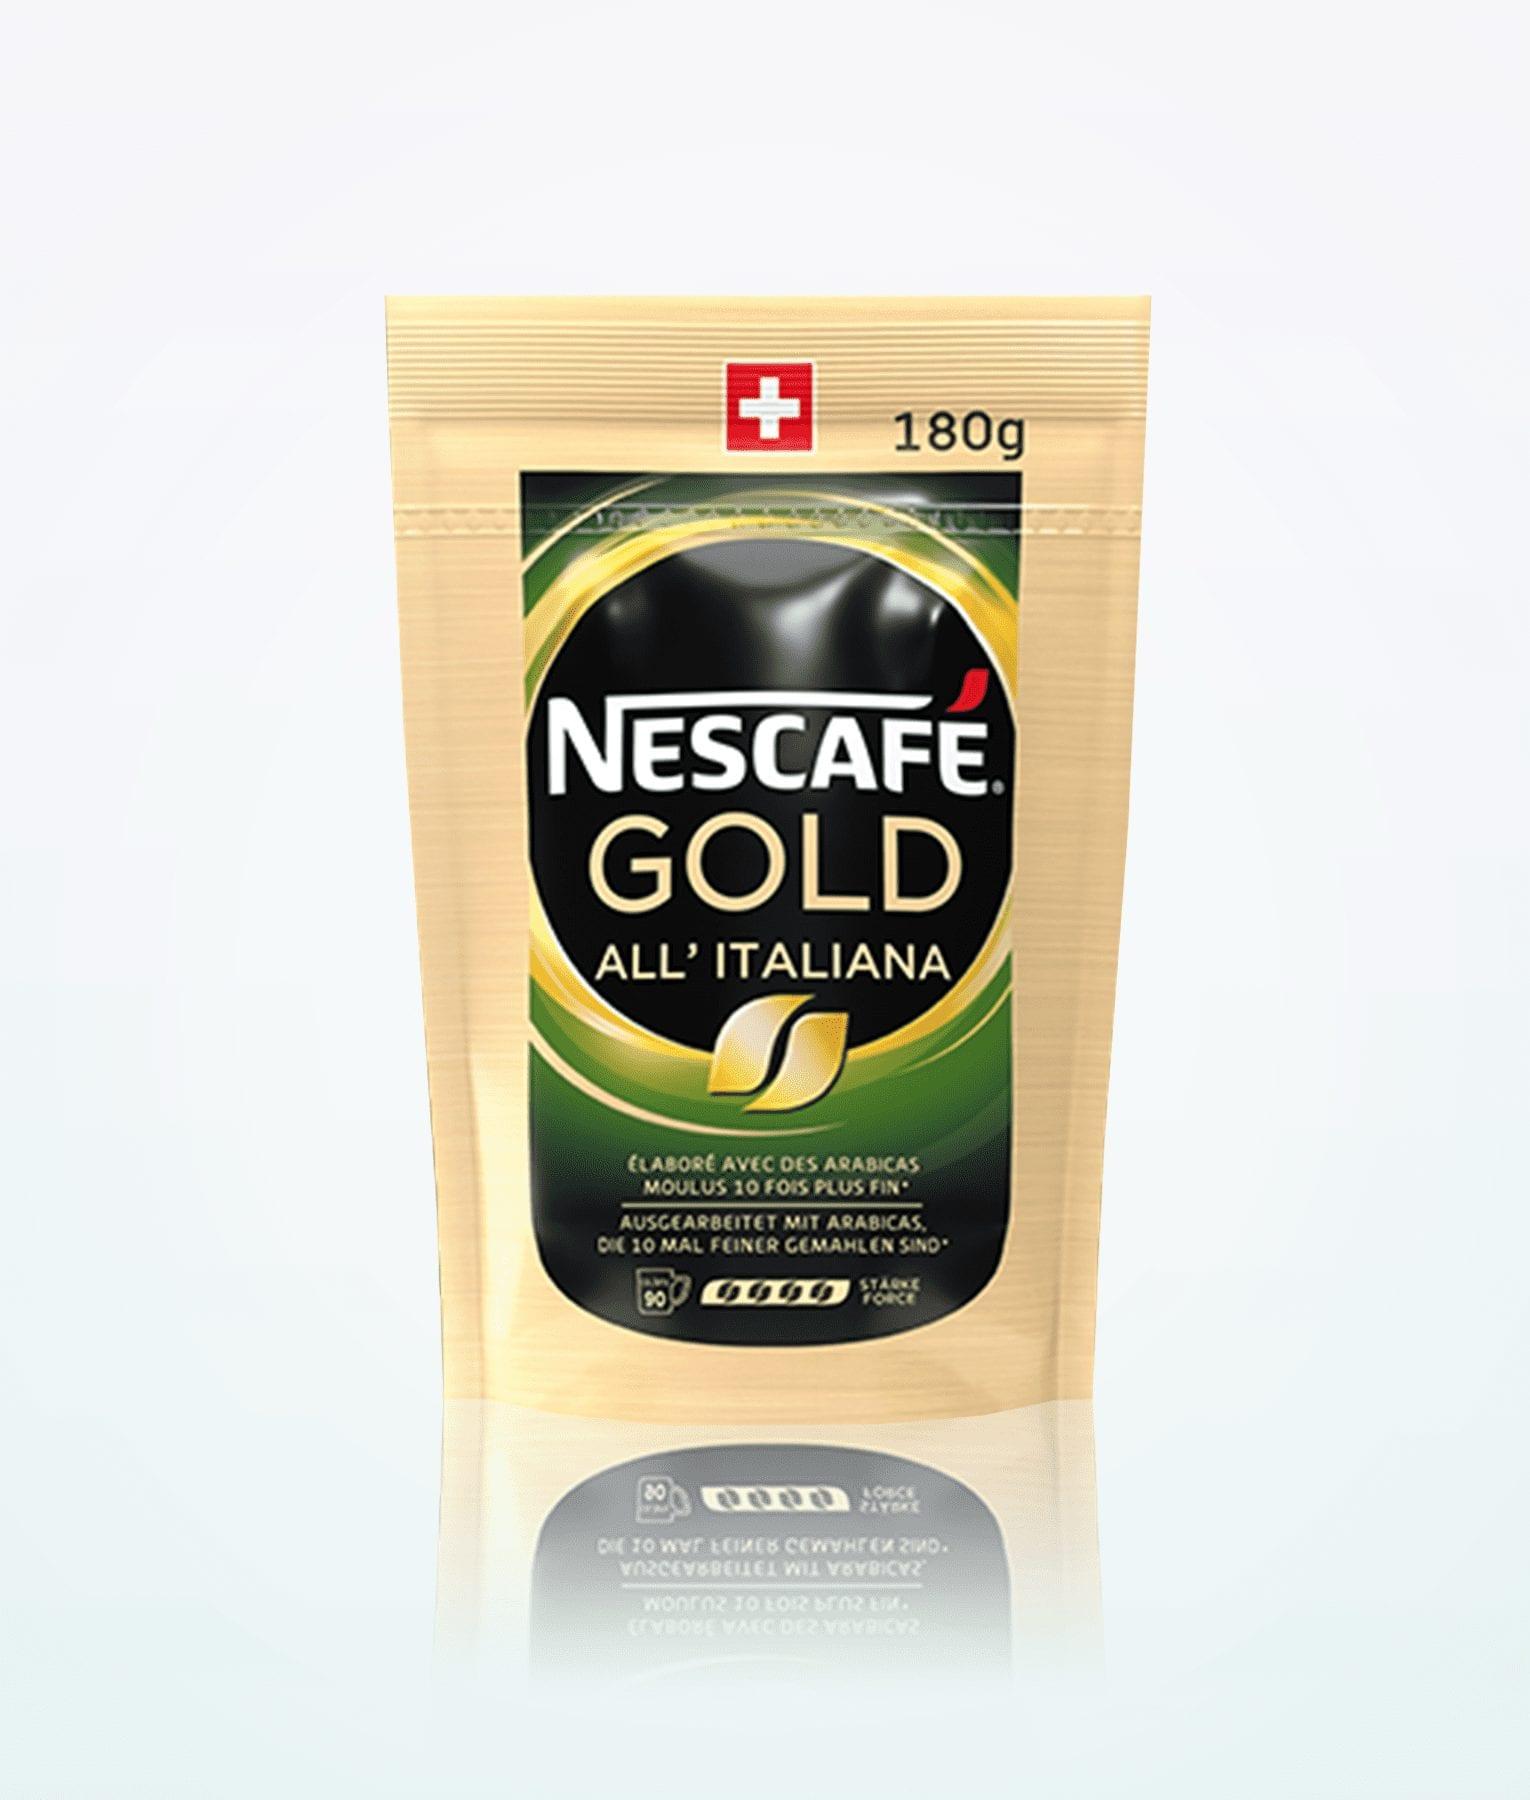 nescafe-gold-all-italiana-180g